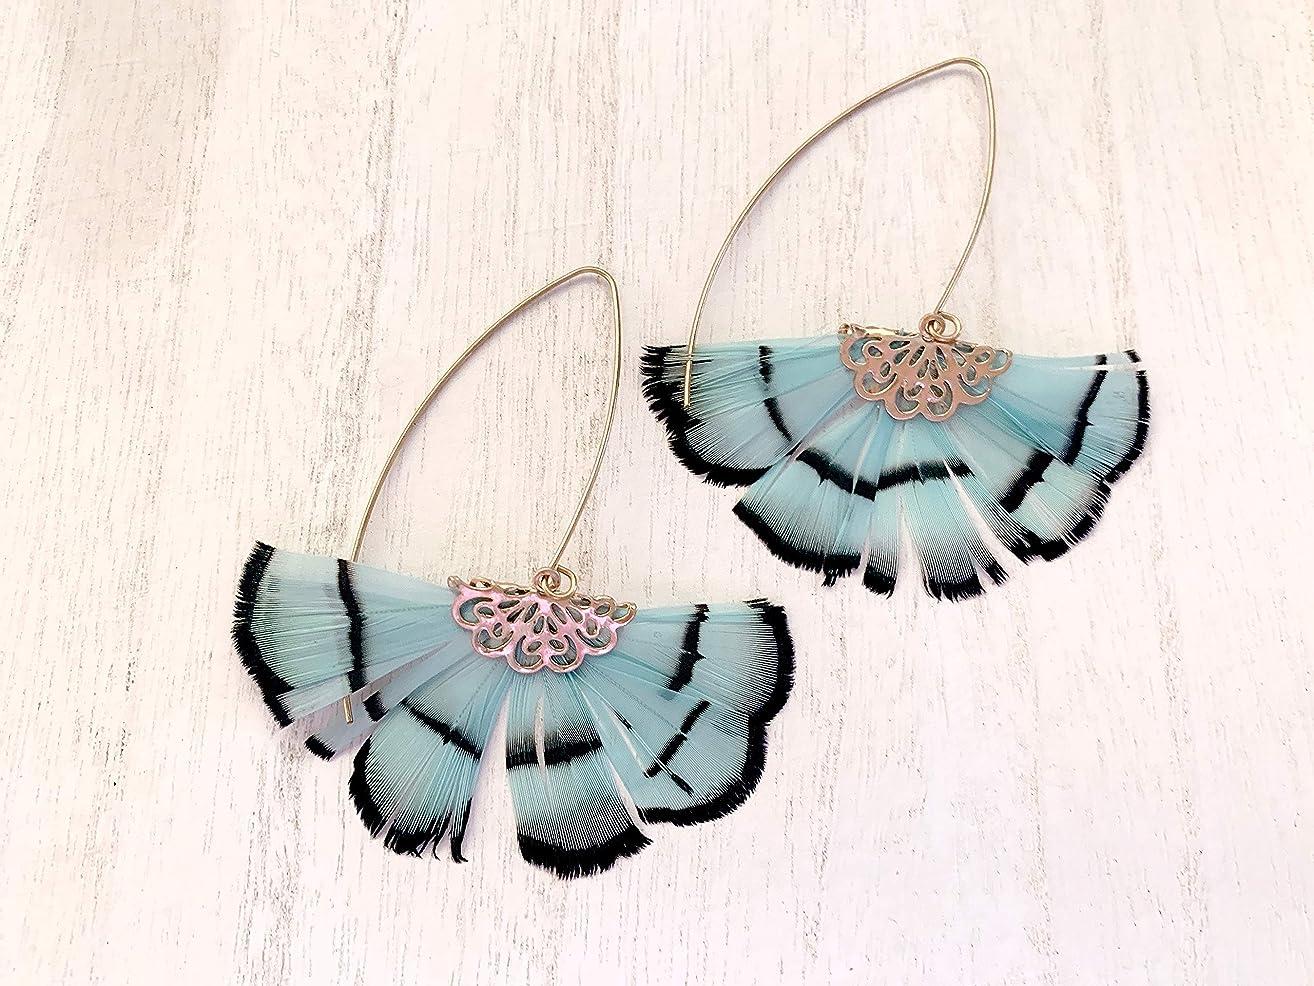 Gold Feather Earrings, Mint Feather dangle Earrings, Oriental Gold Feather Hoop Earrings, Statement Earrings Hero, Statement Jewelry